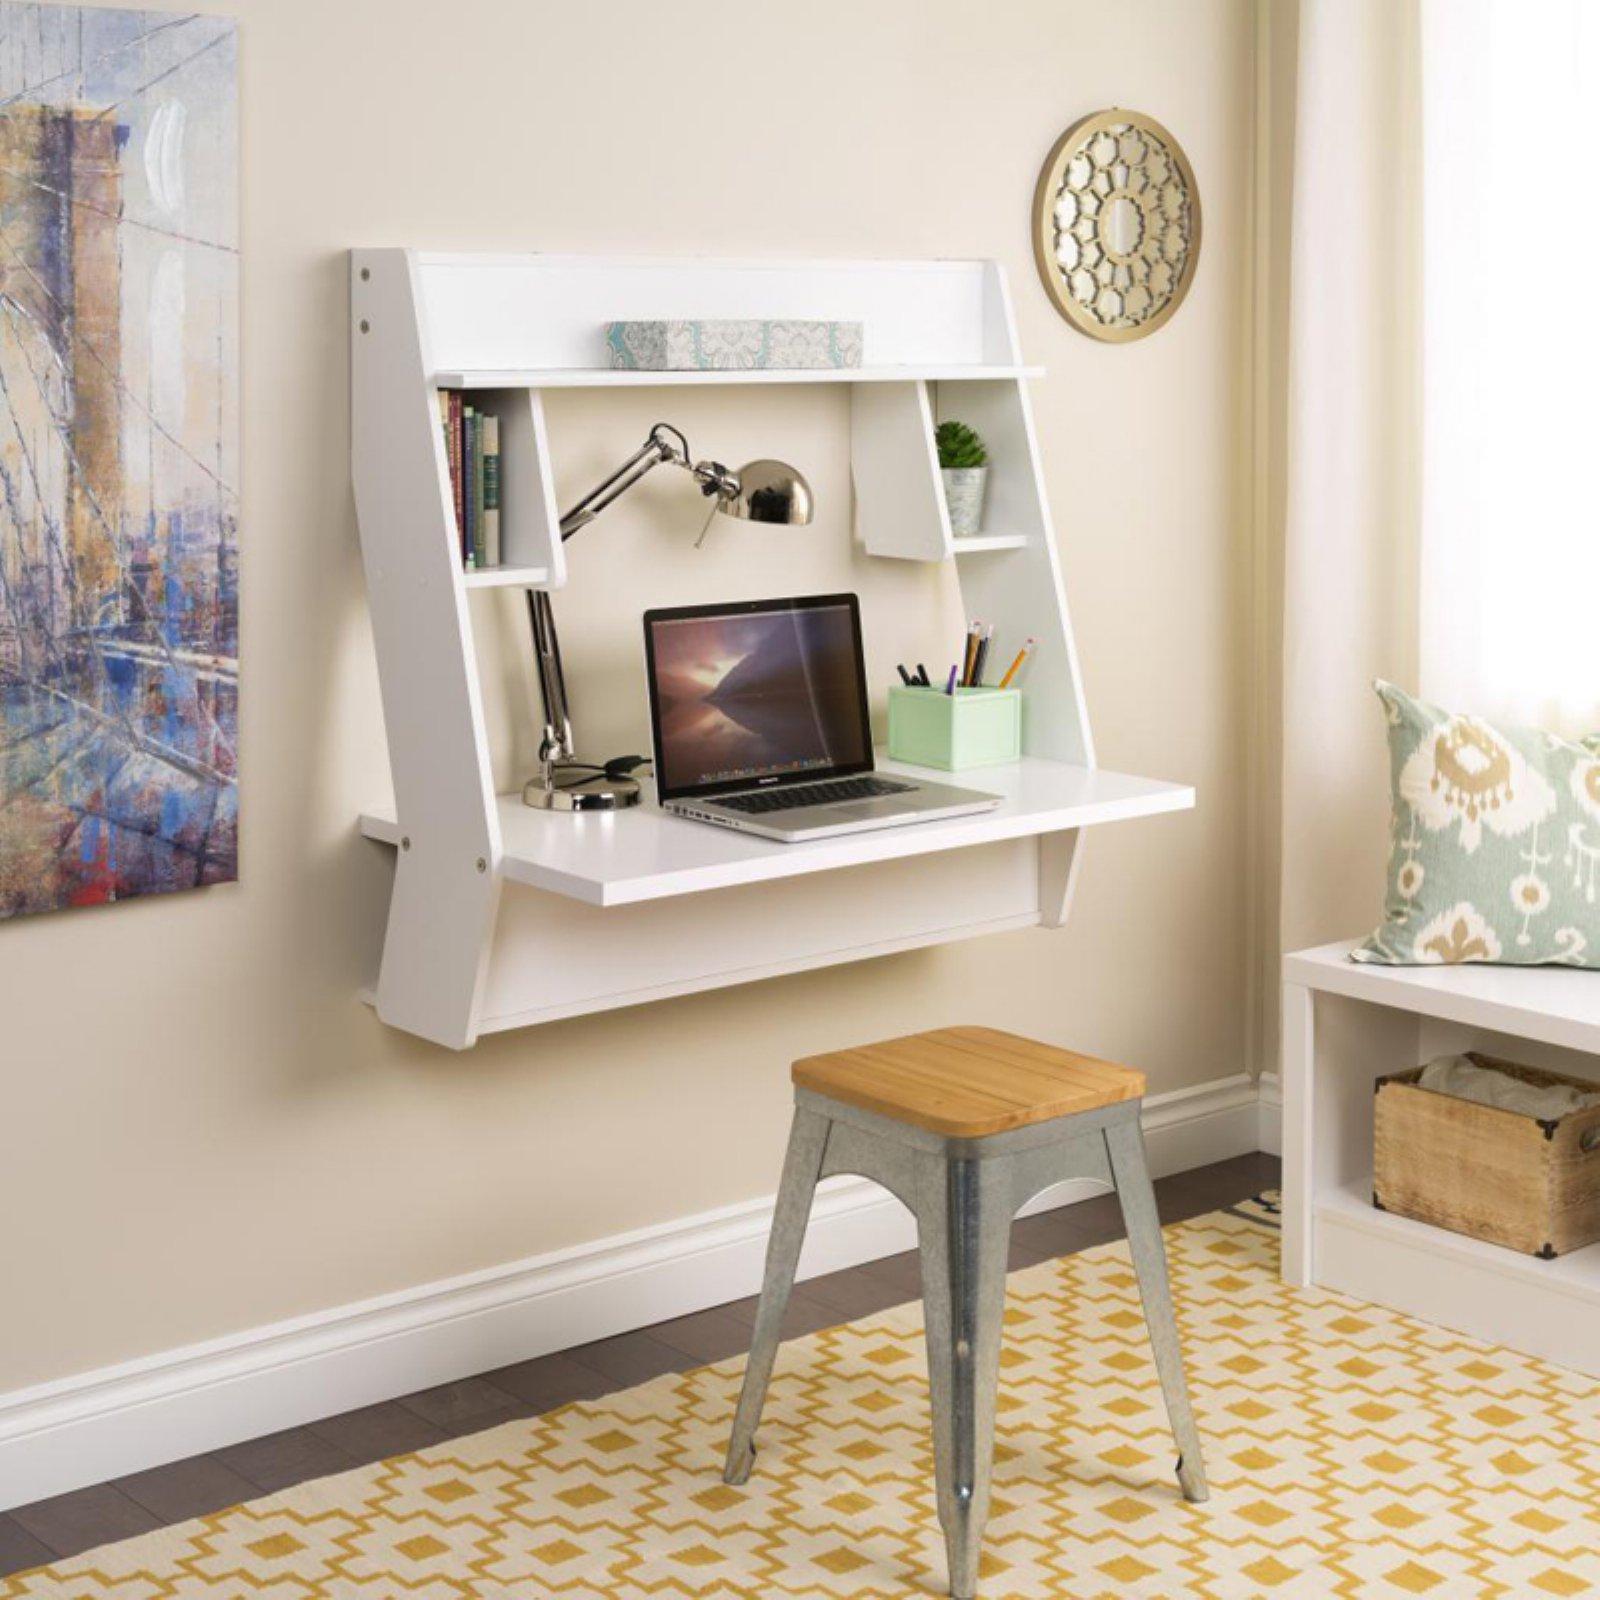 Prepac Studio Floating Laptop Desk by LIVEDITOR LIGHTING